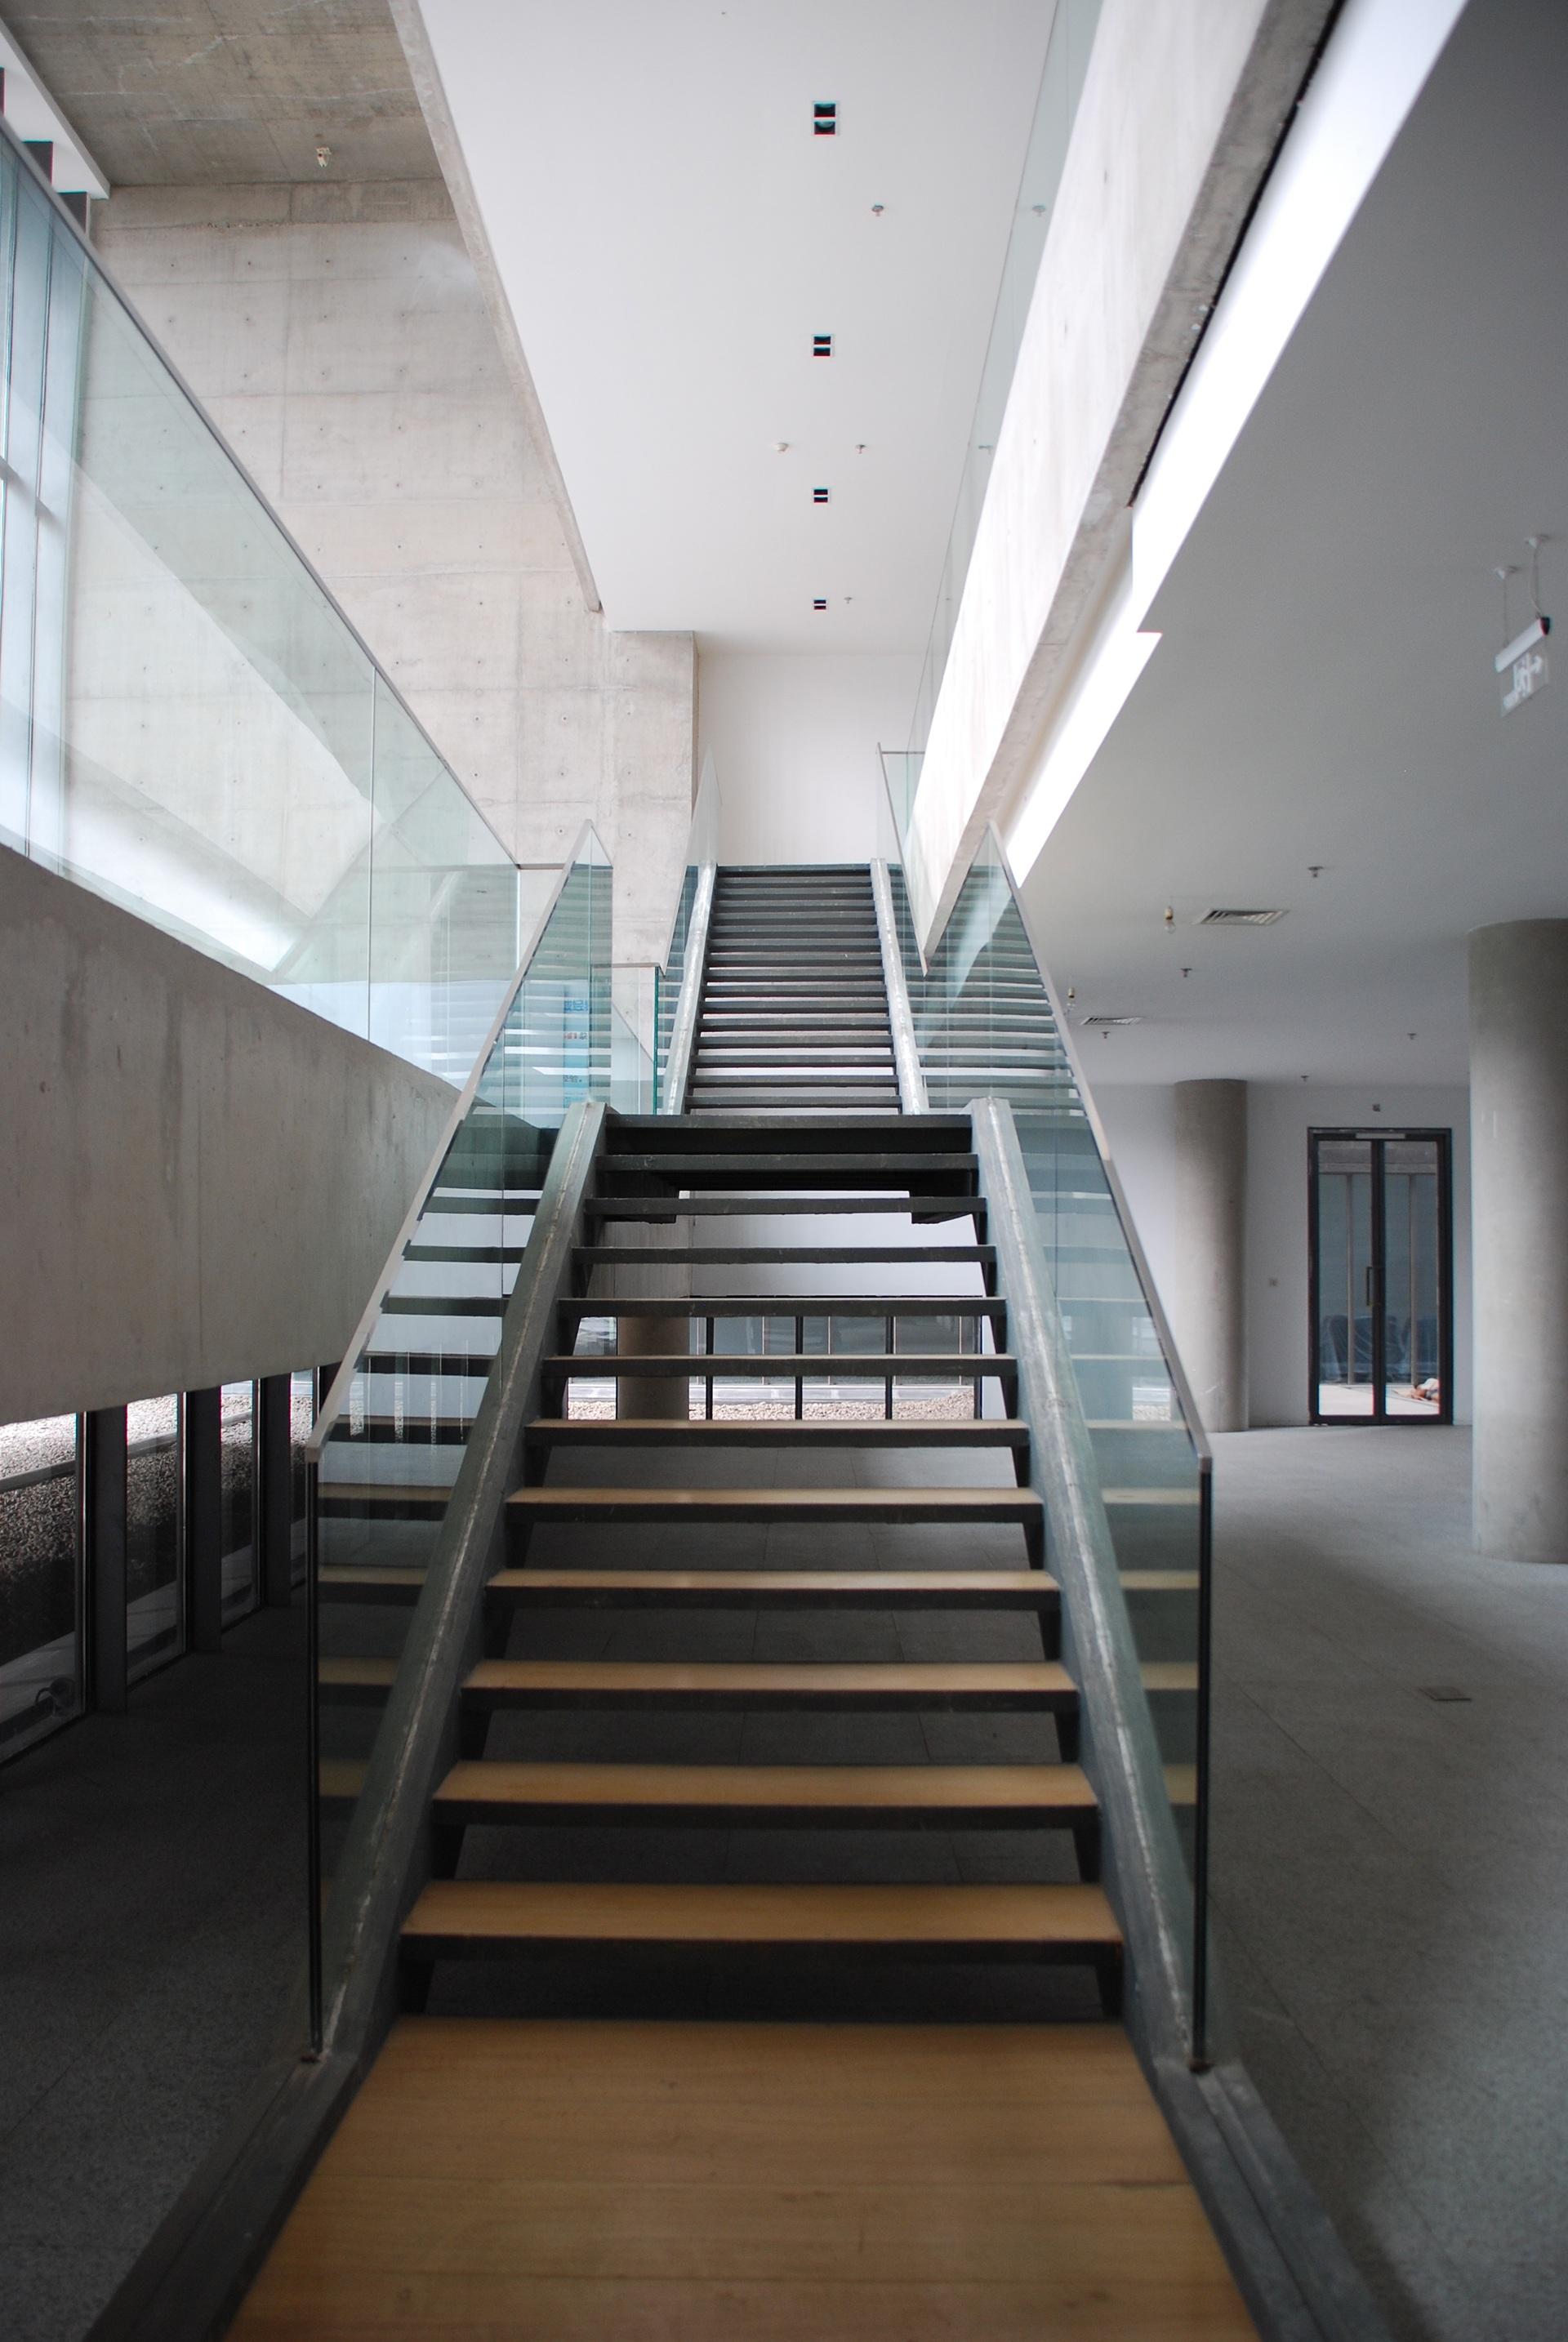 Fotos gratis arquitectura piso edificio sala - Diseno de escaleras interiores ...